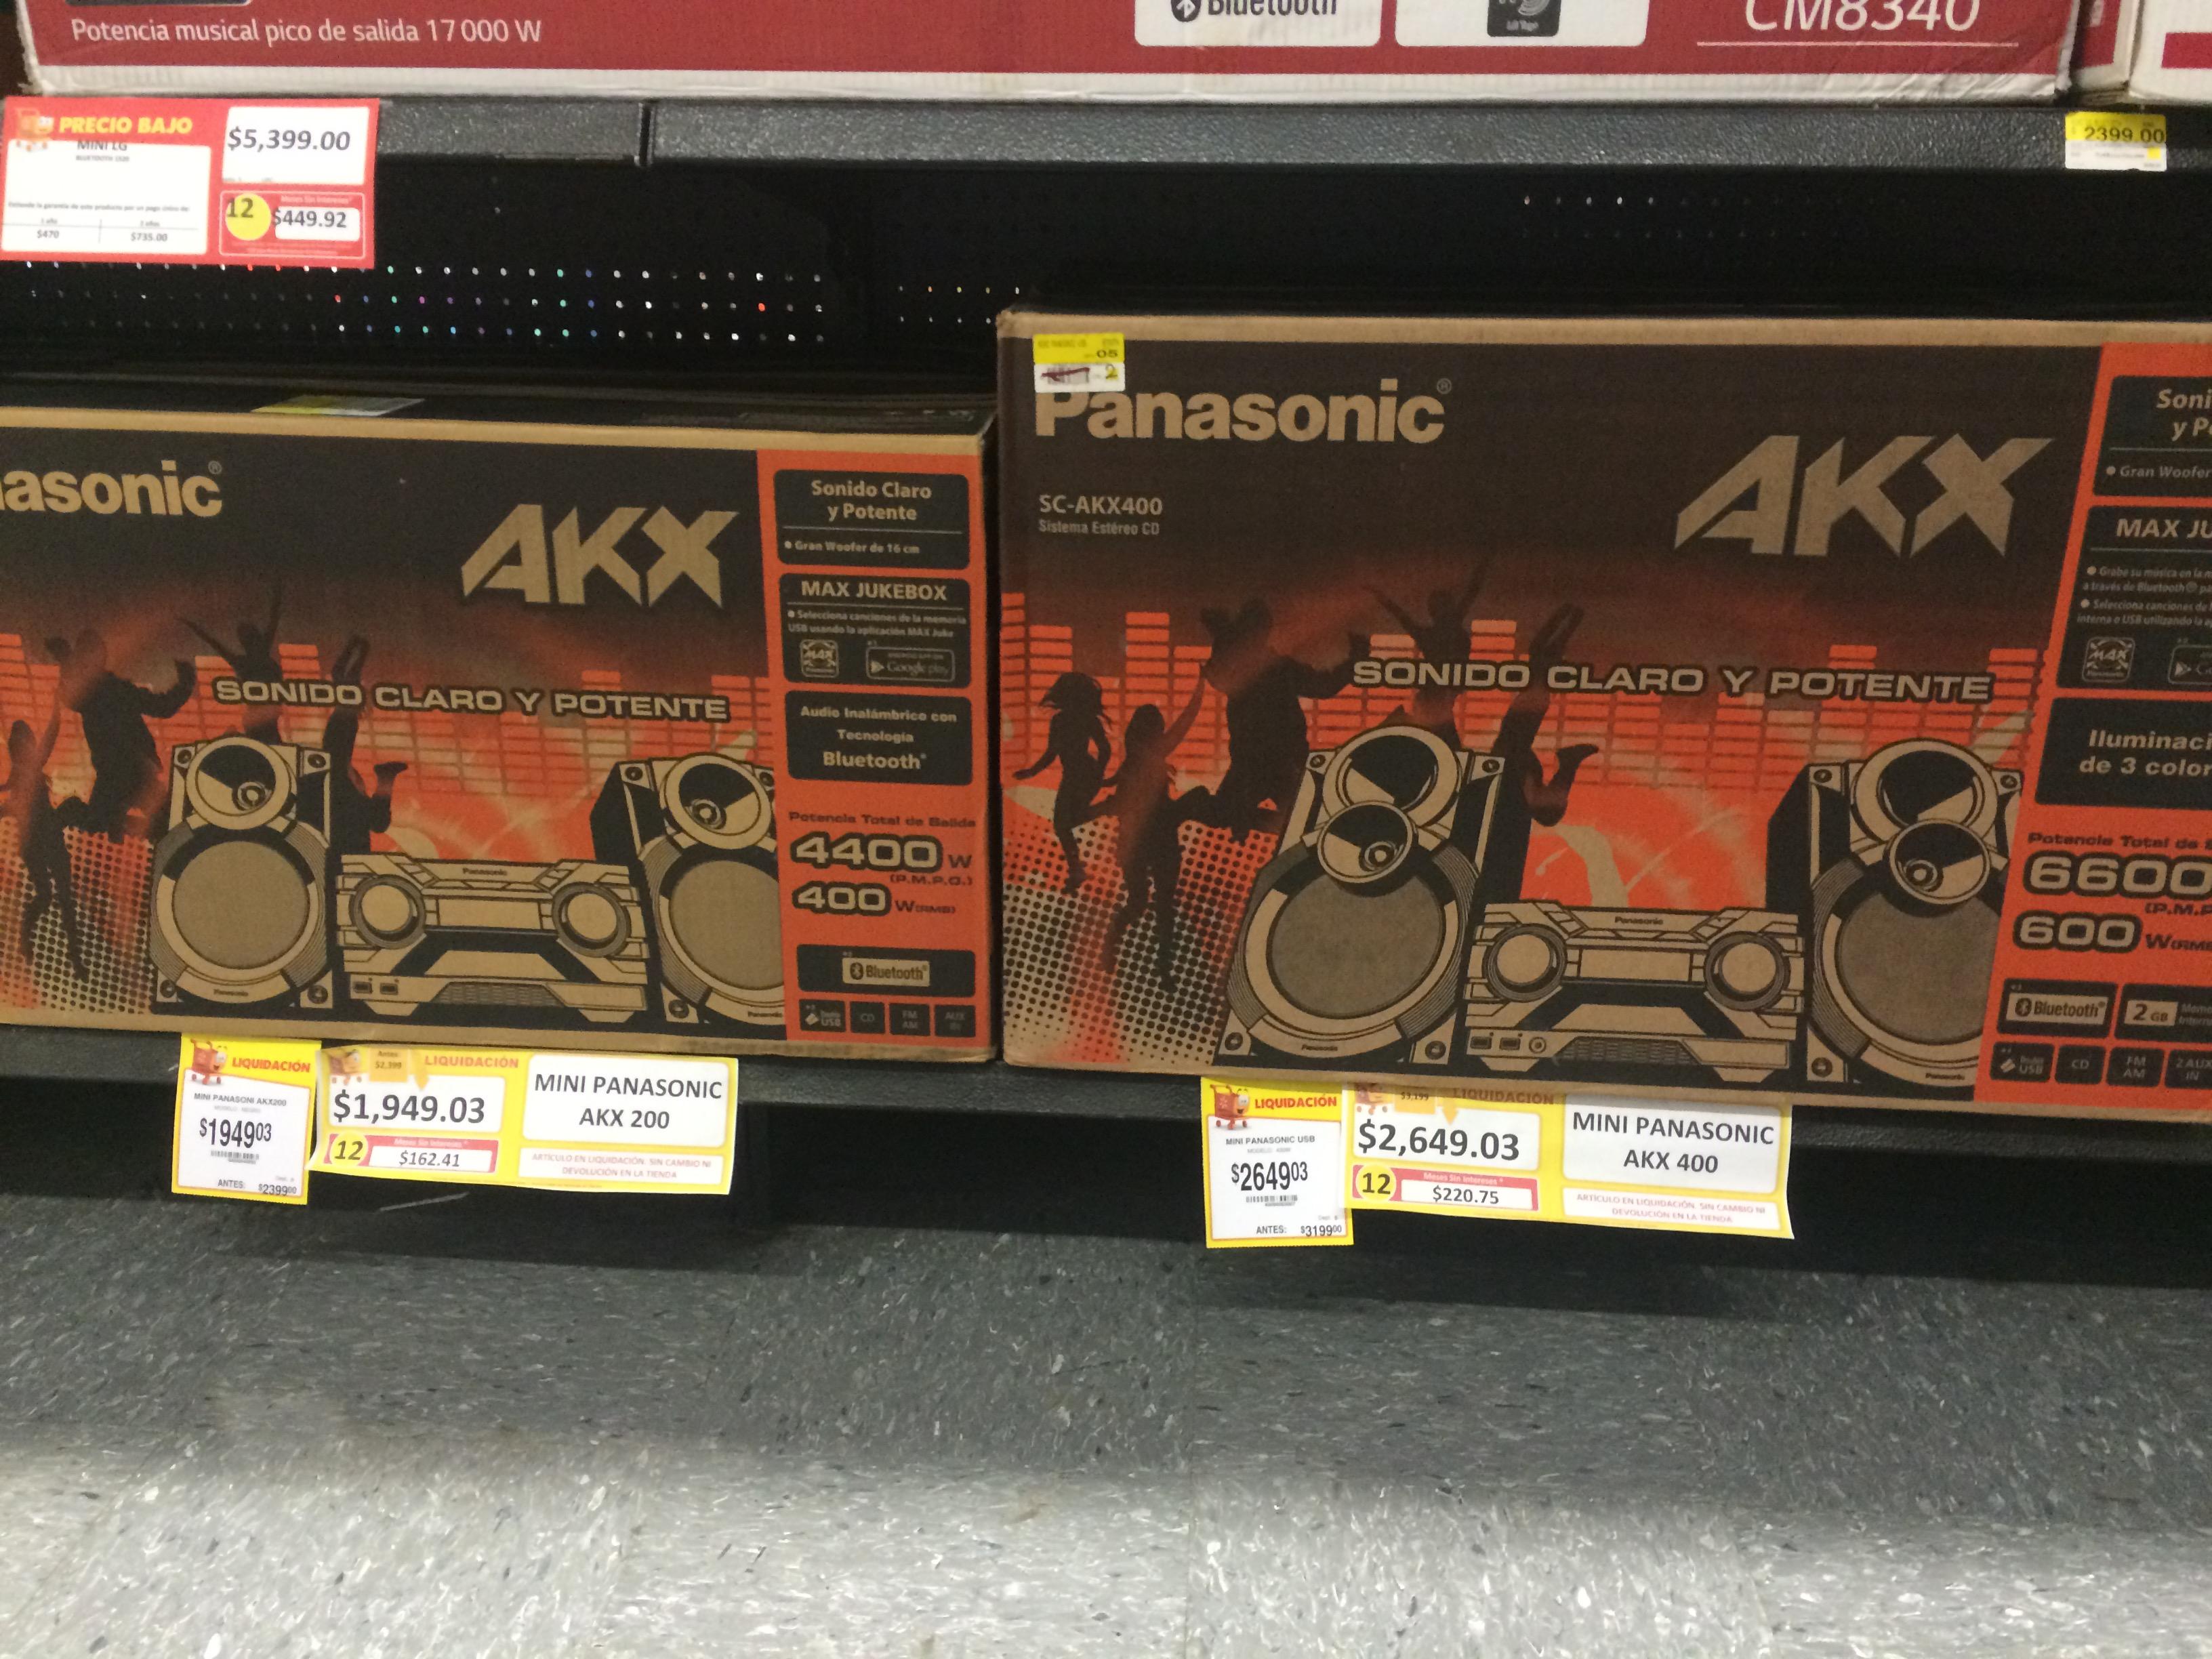 Walmart: Panasonic AKX200 a $1,949